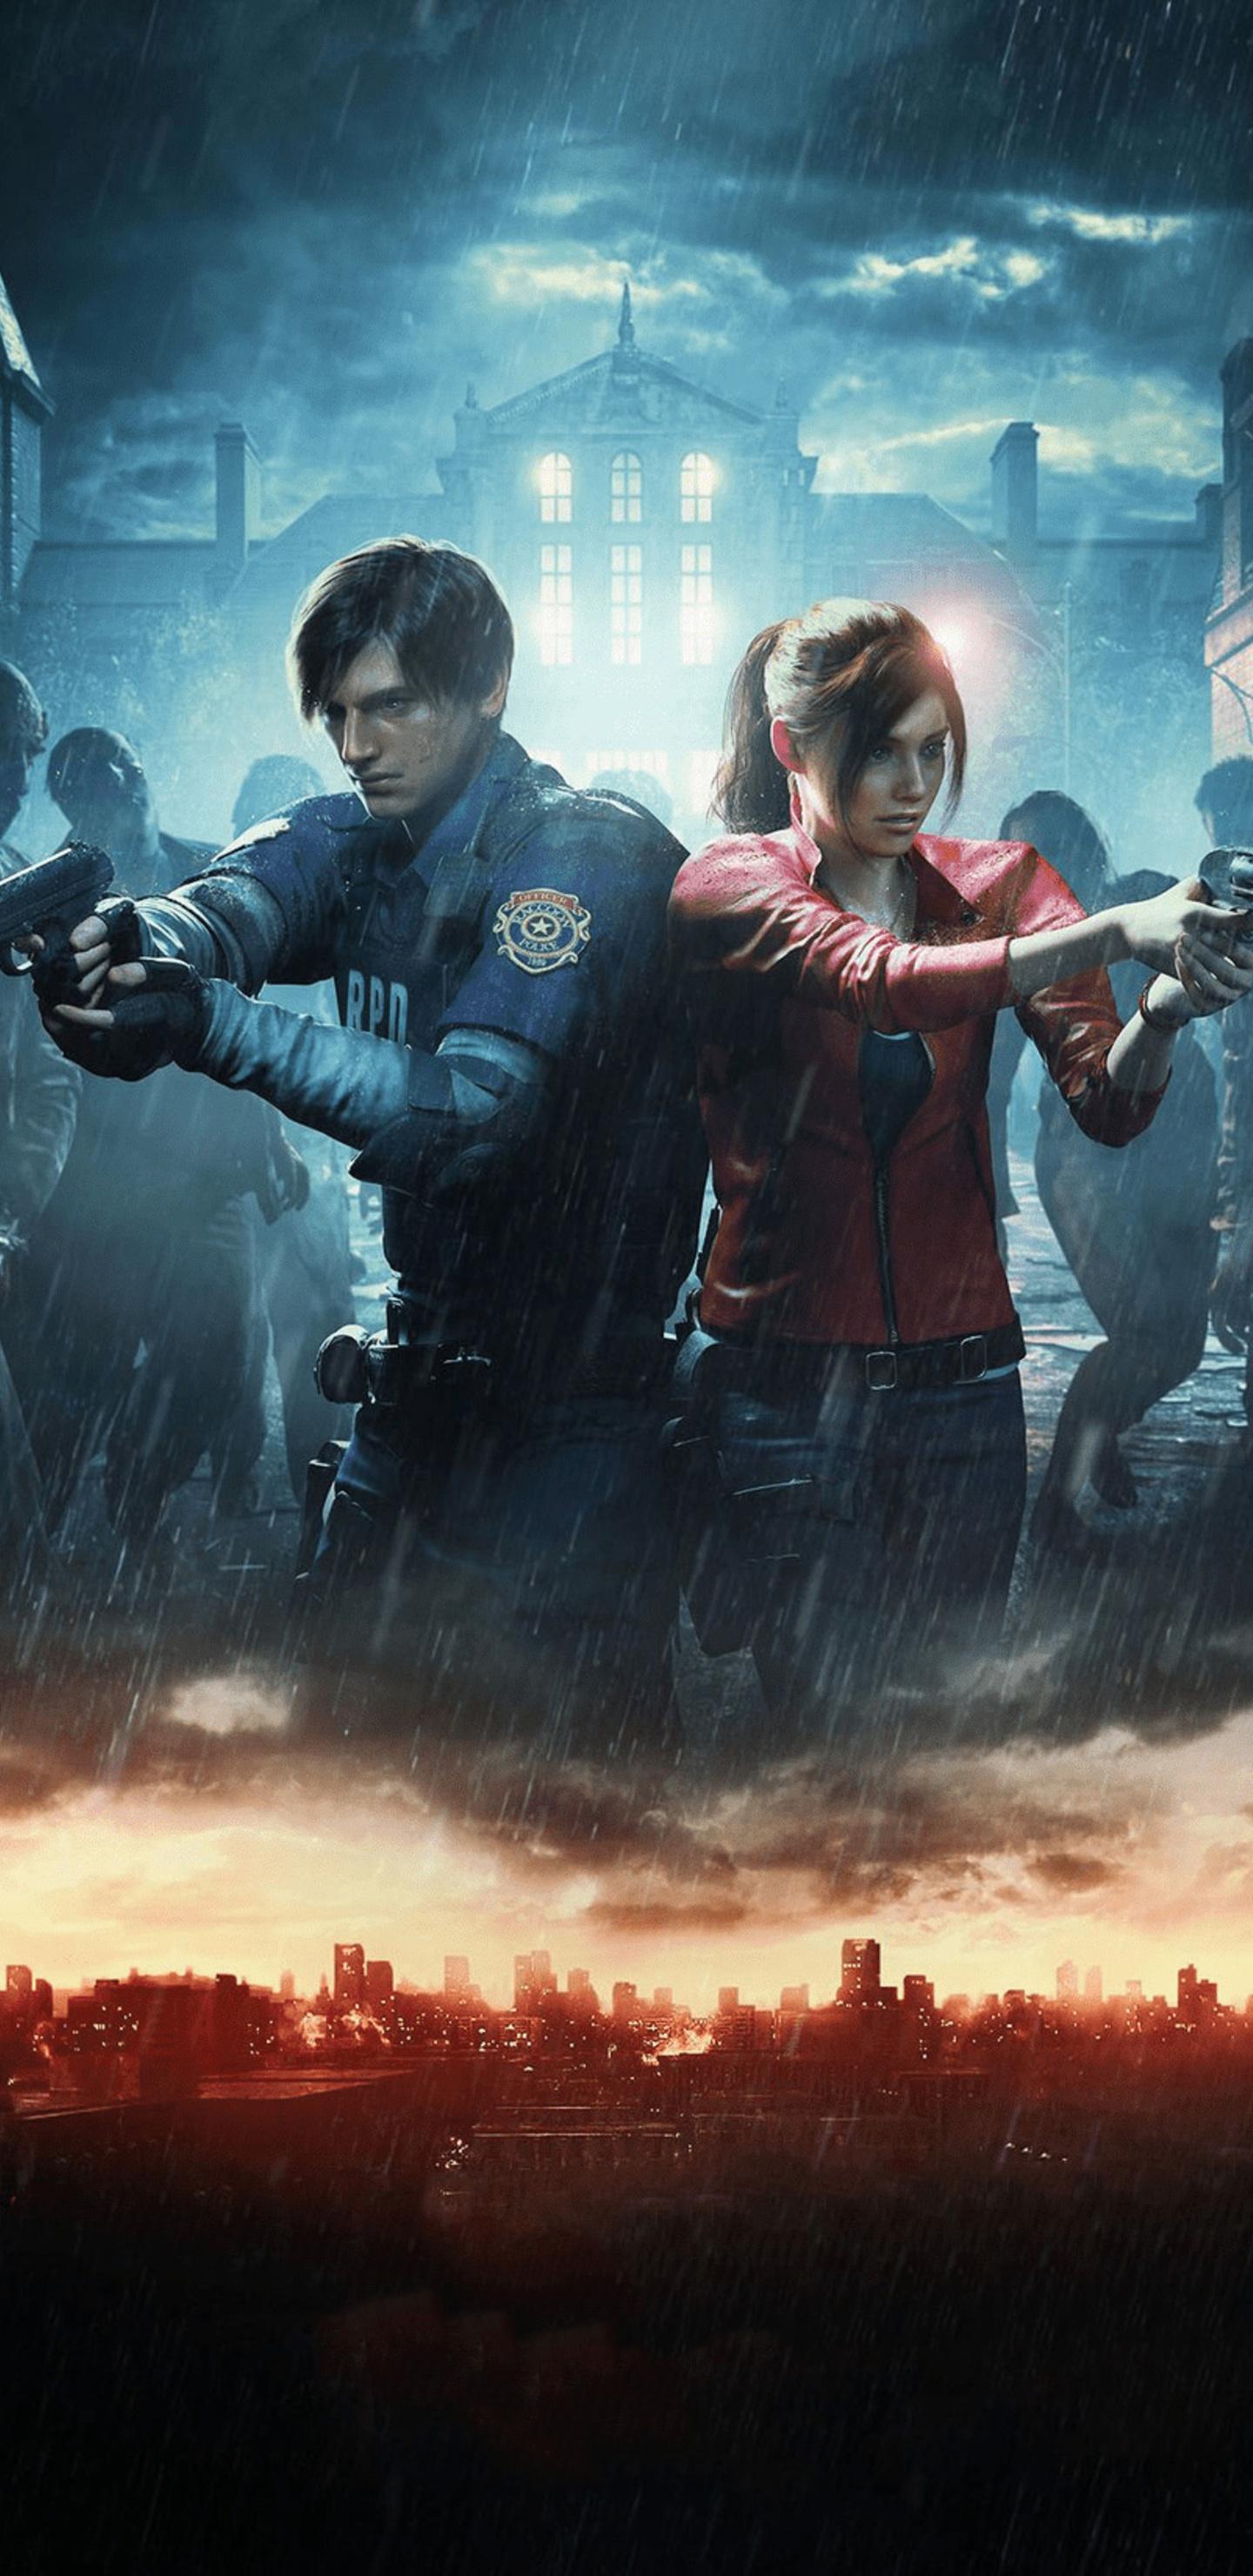 1440x2960 Resident Evil 2 Official Art 2019 Samsung Galaxy ...